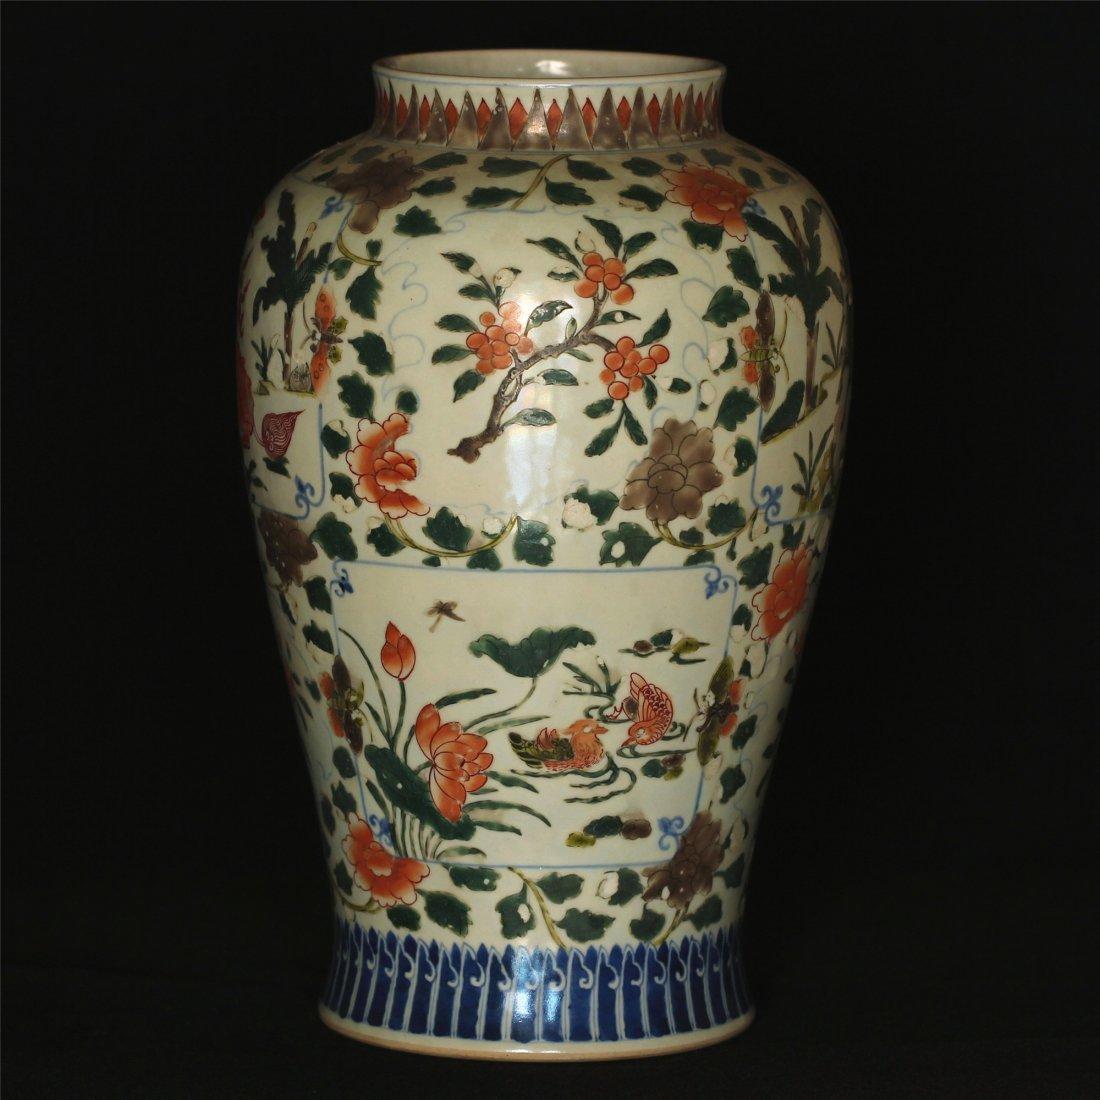 Blue and white & color porcelain jar.